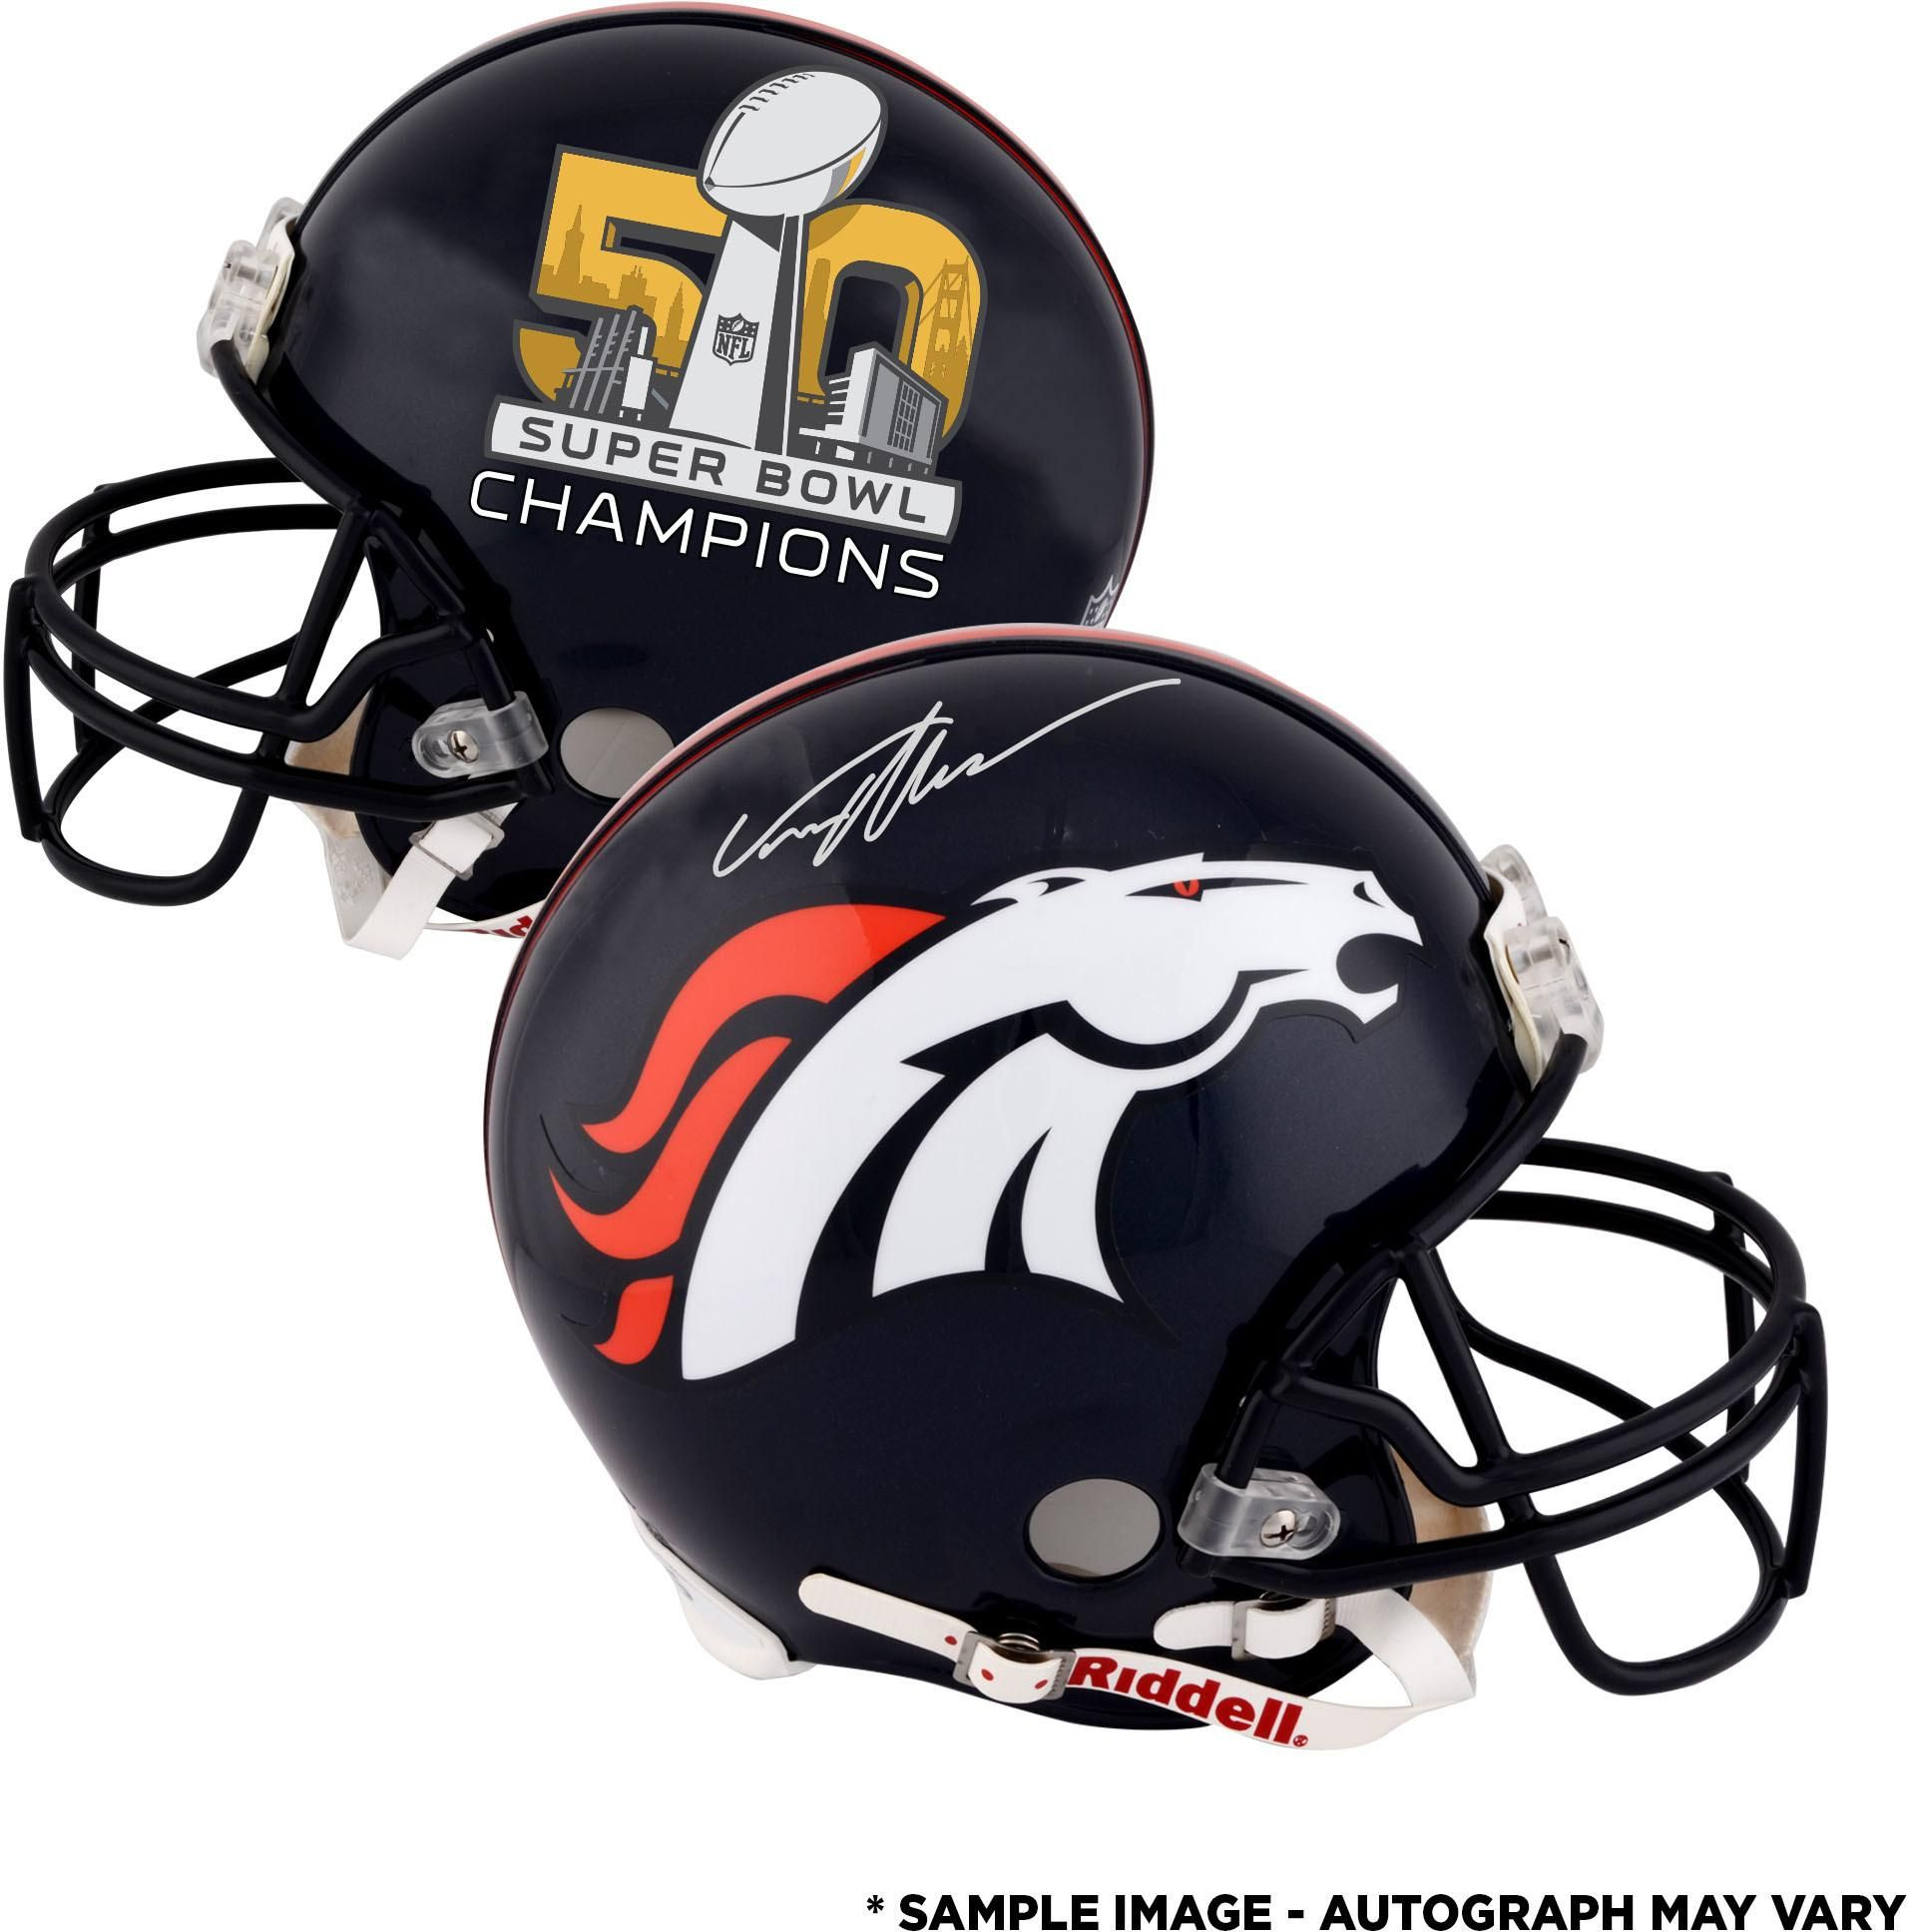 Von Miller Denver Broncos Autographed Riddell Super Bowl 50 Champions Pro-Line  Helmet 548aa47fc